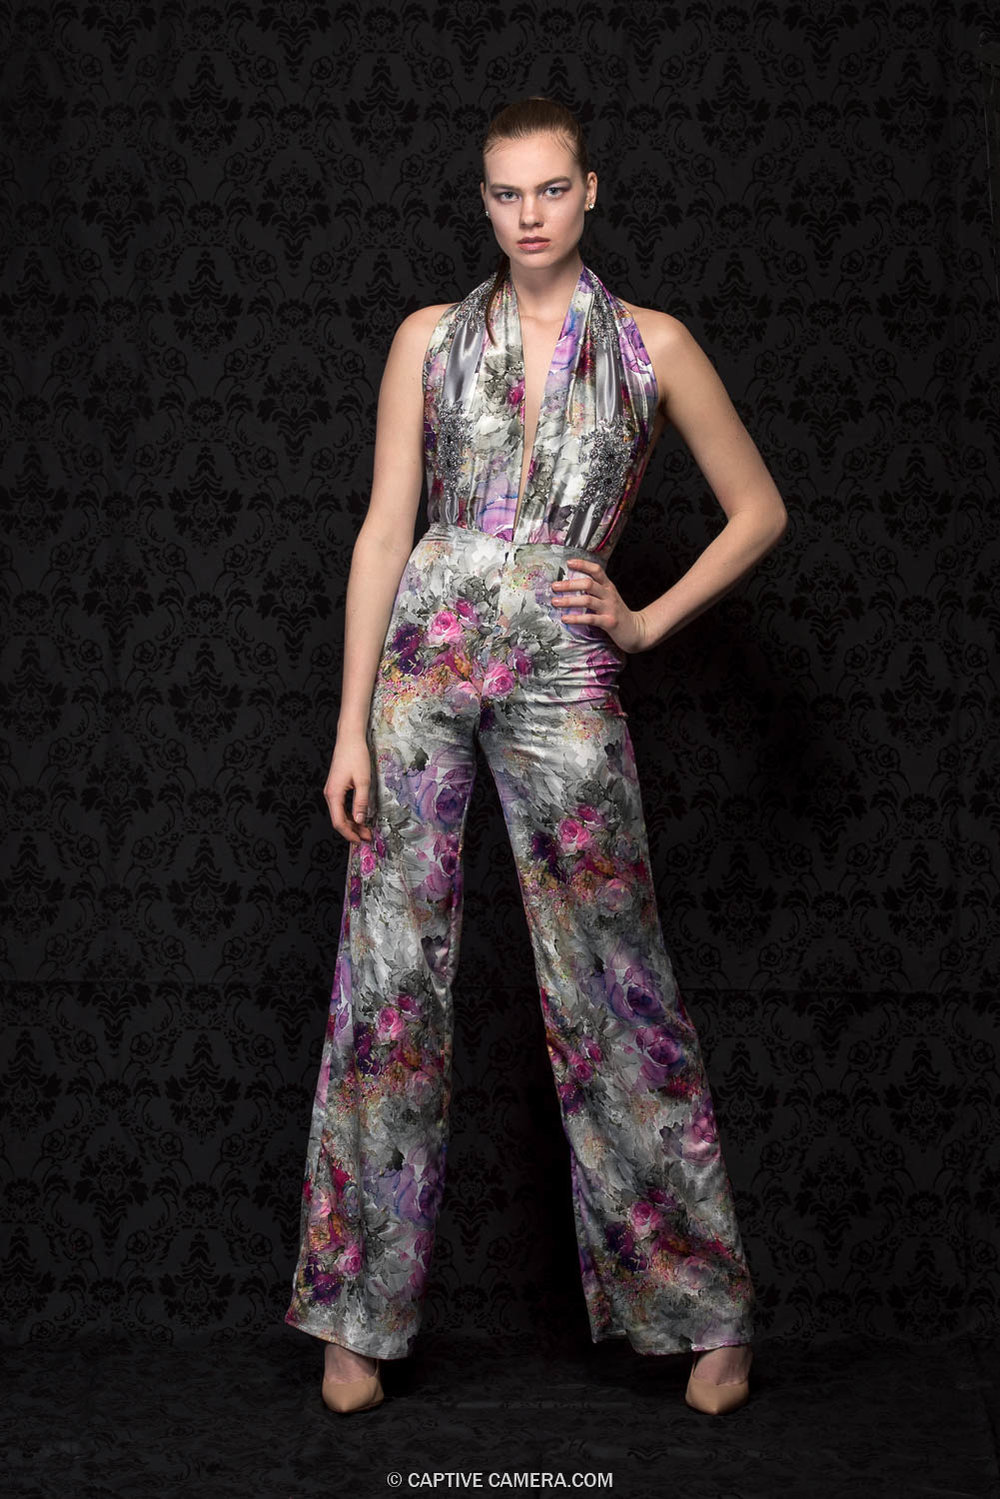 Toronto fashion and model photographer